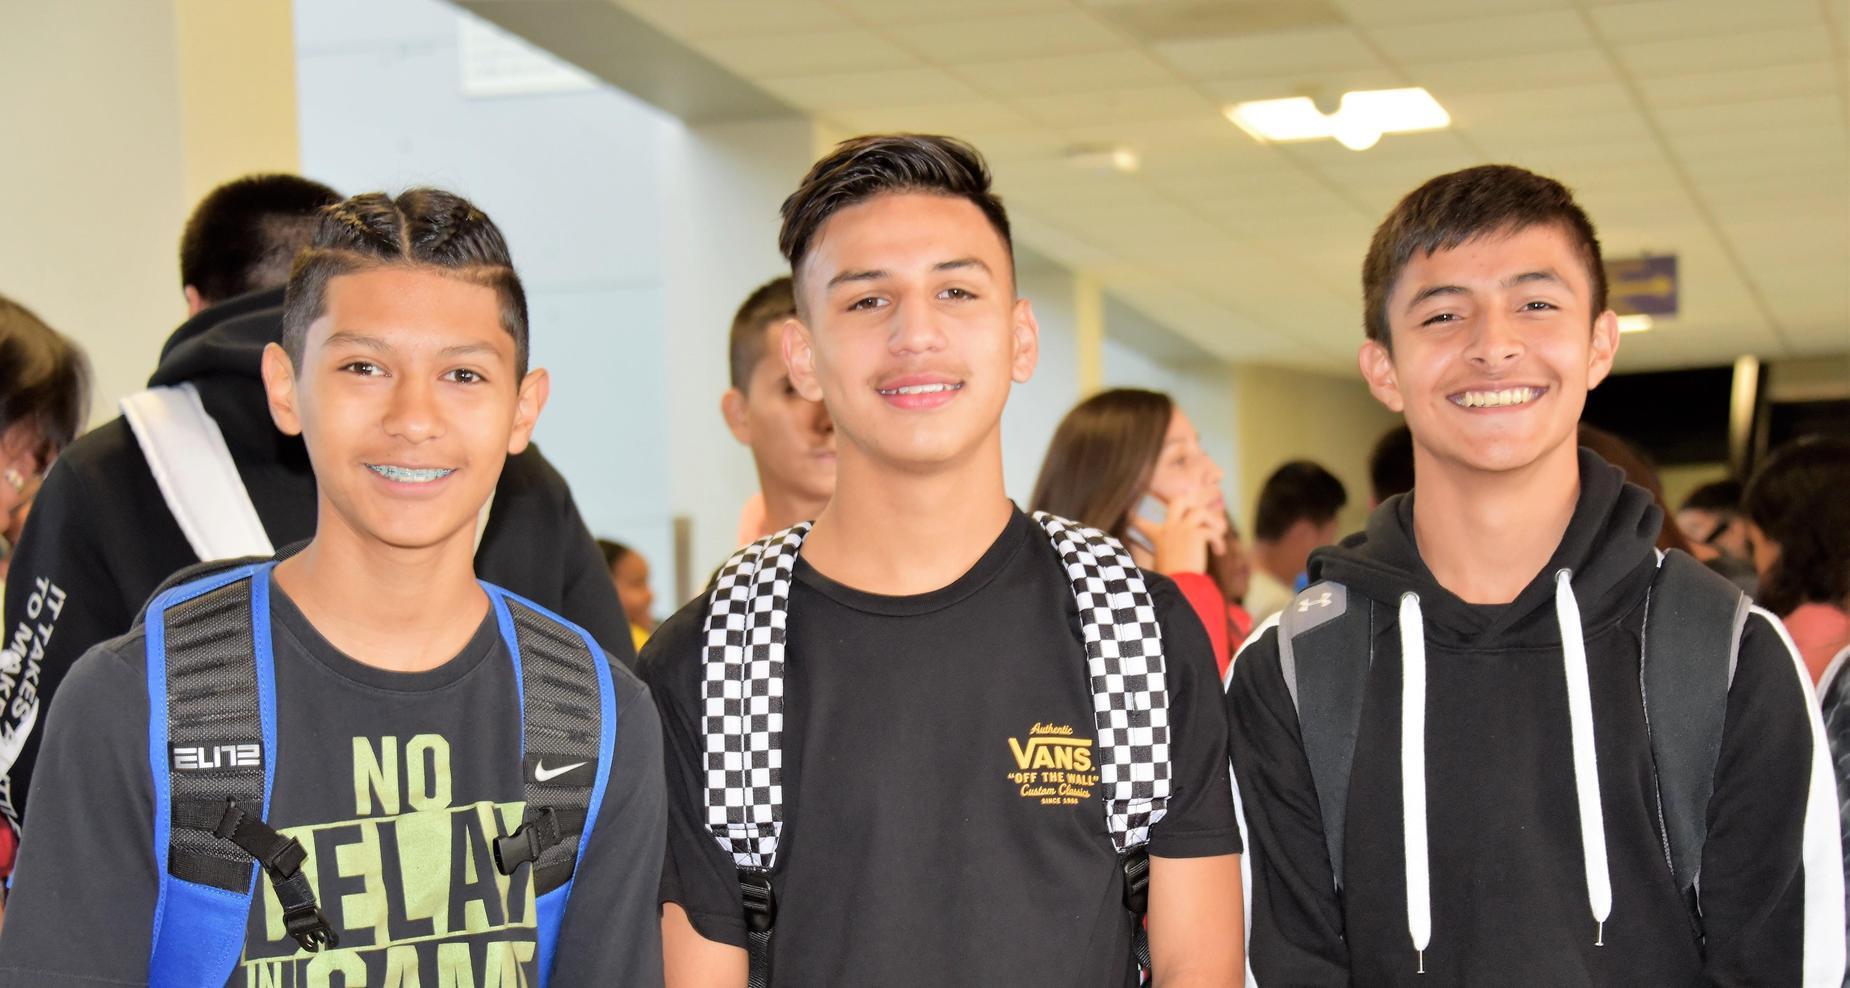 Boys smiling.